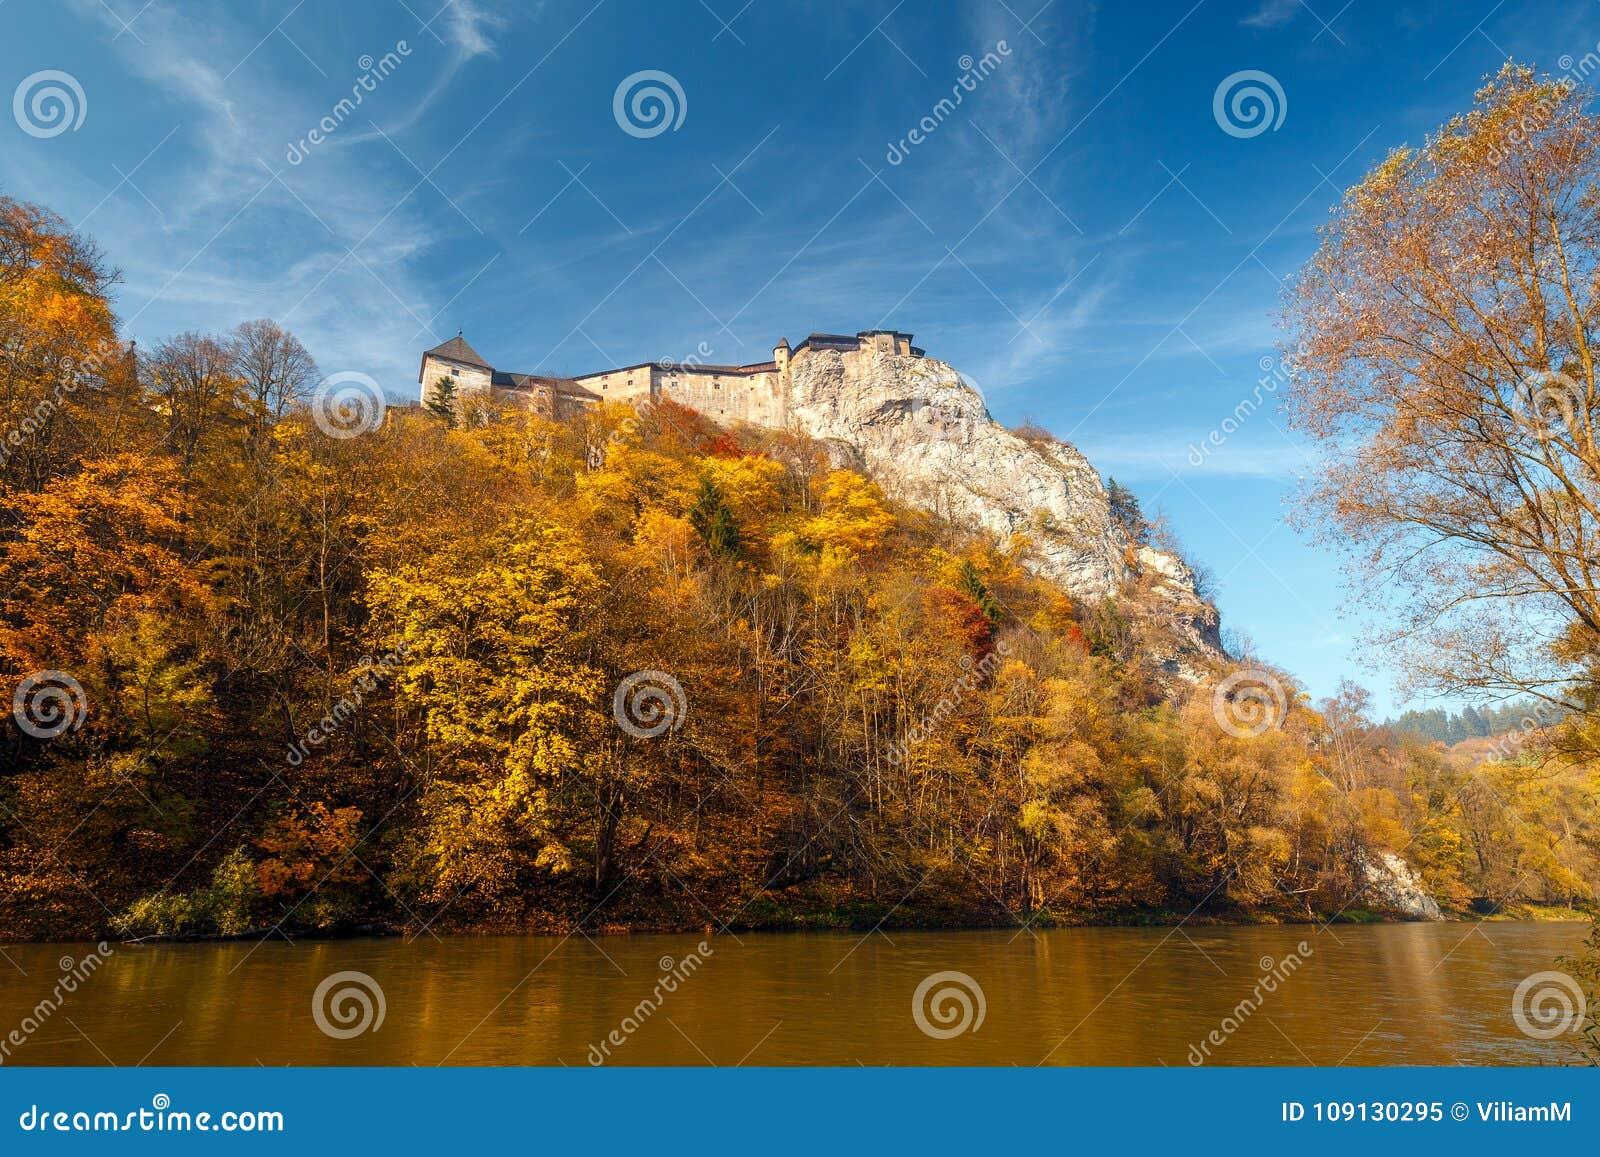 The medieval Orava Castle.